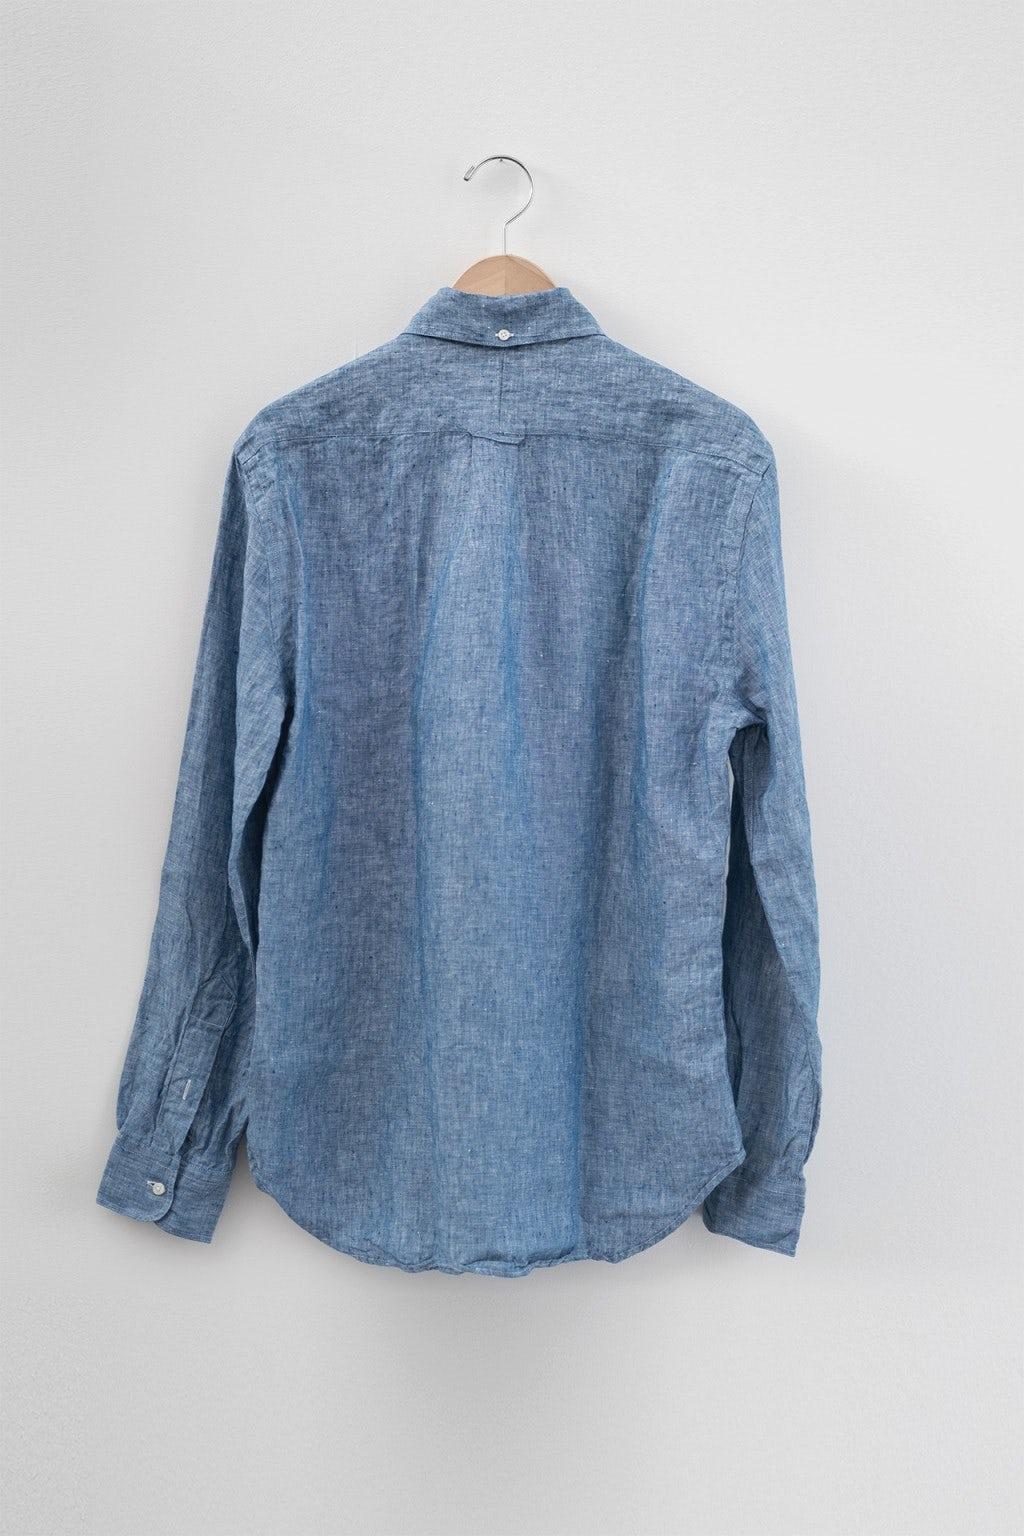 Gitman Bros. Vintage Button Down Blue Chambray Linen